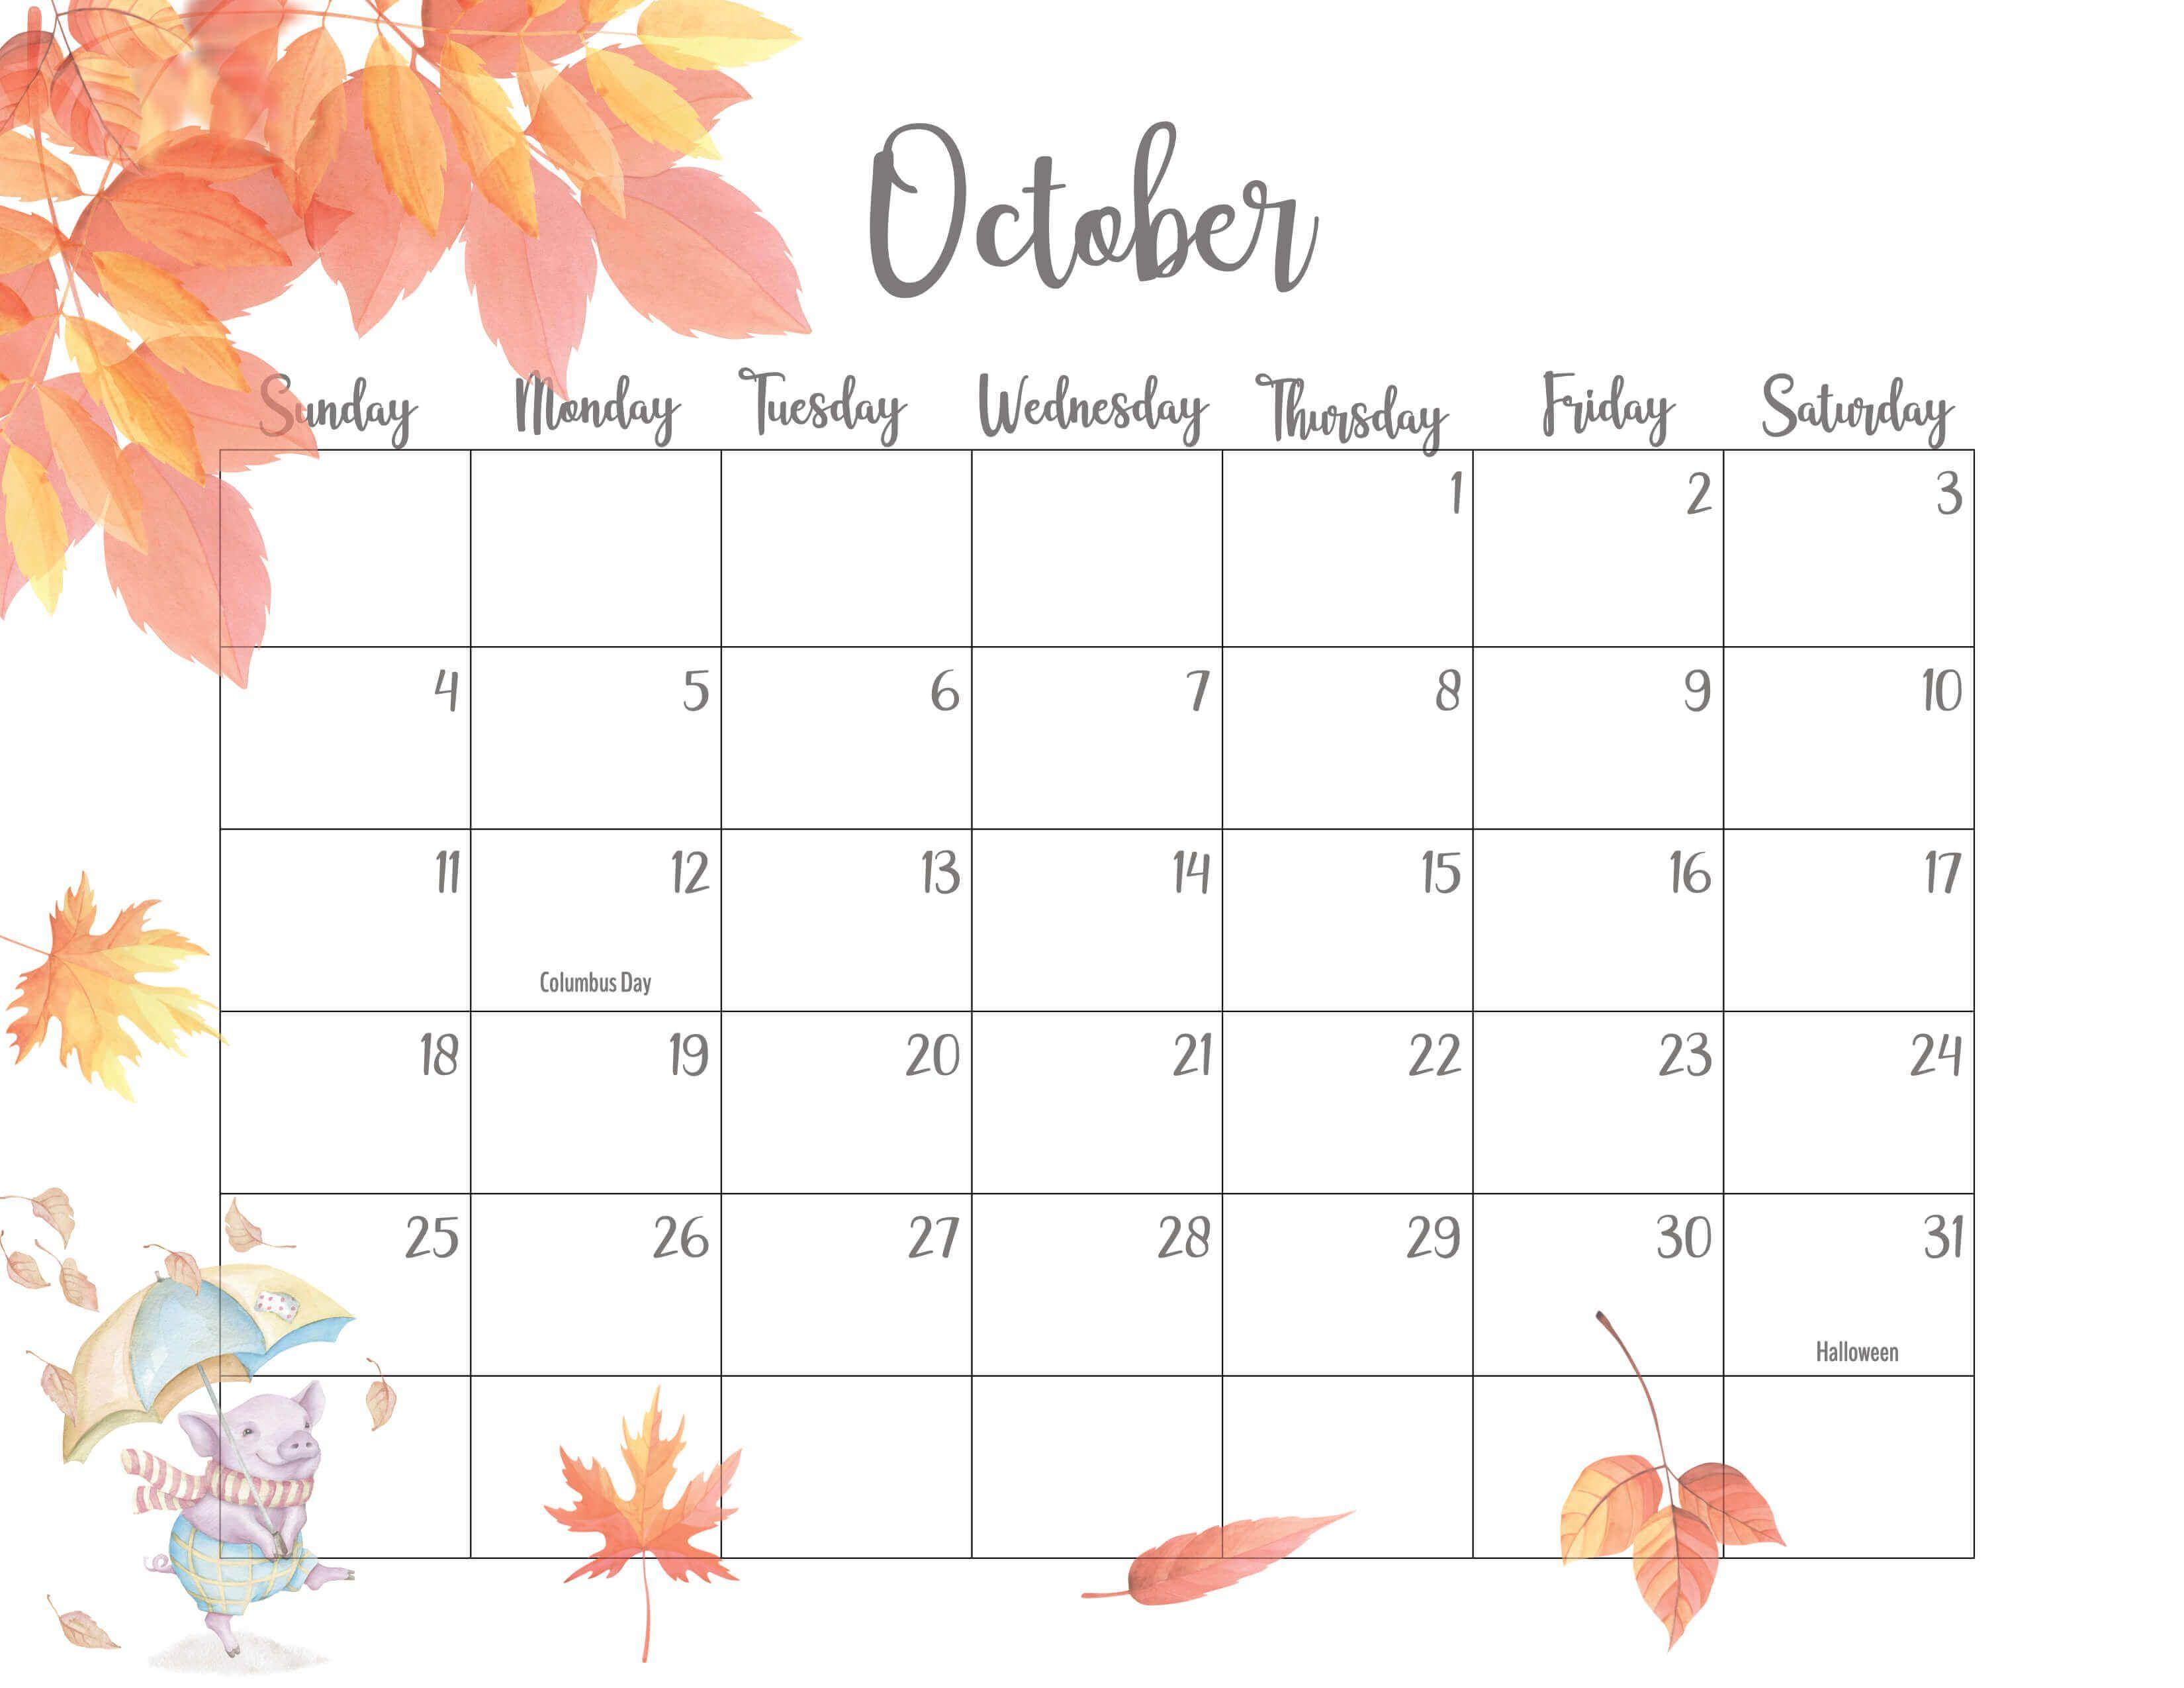 October 2020 Calendar Cute in 2020 | Calendar printables ...